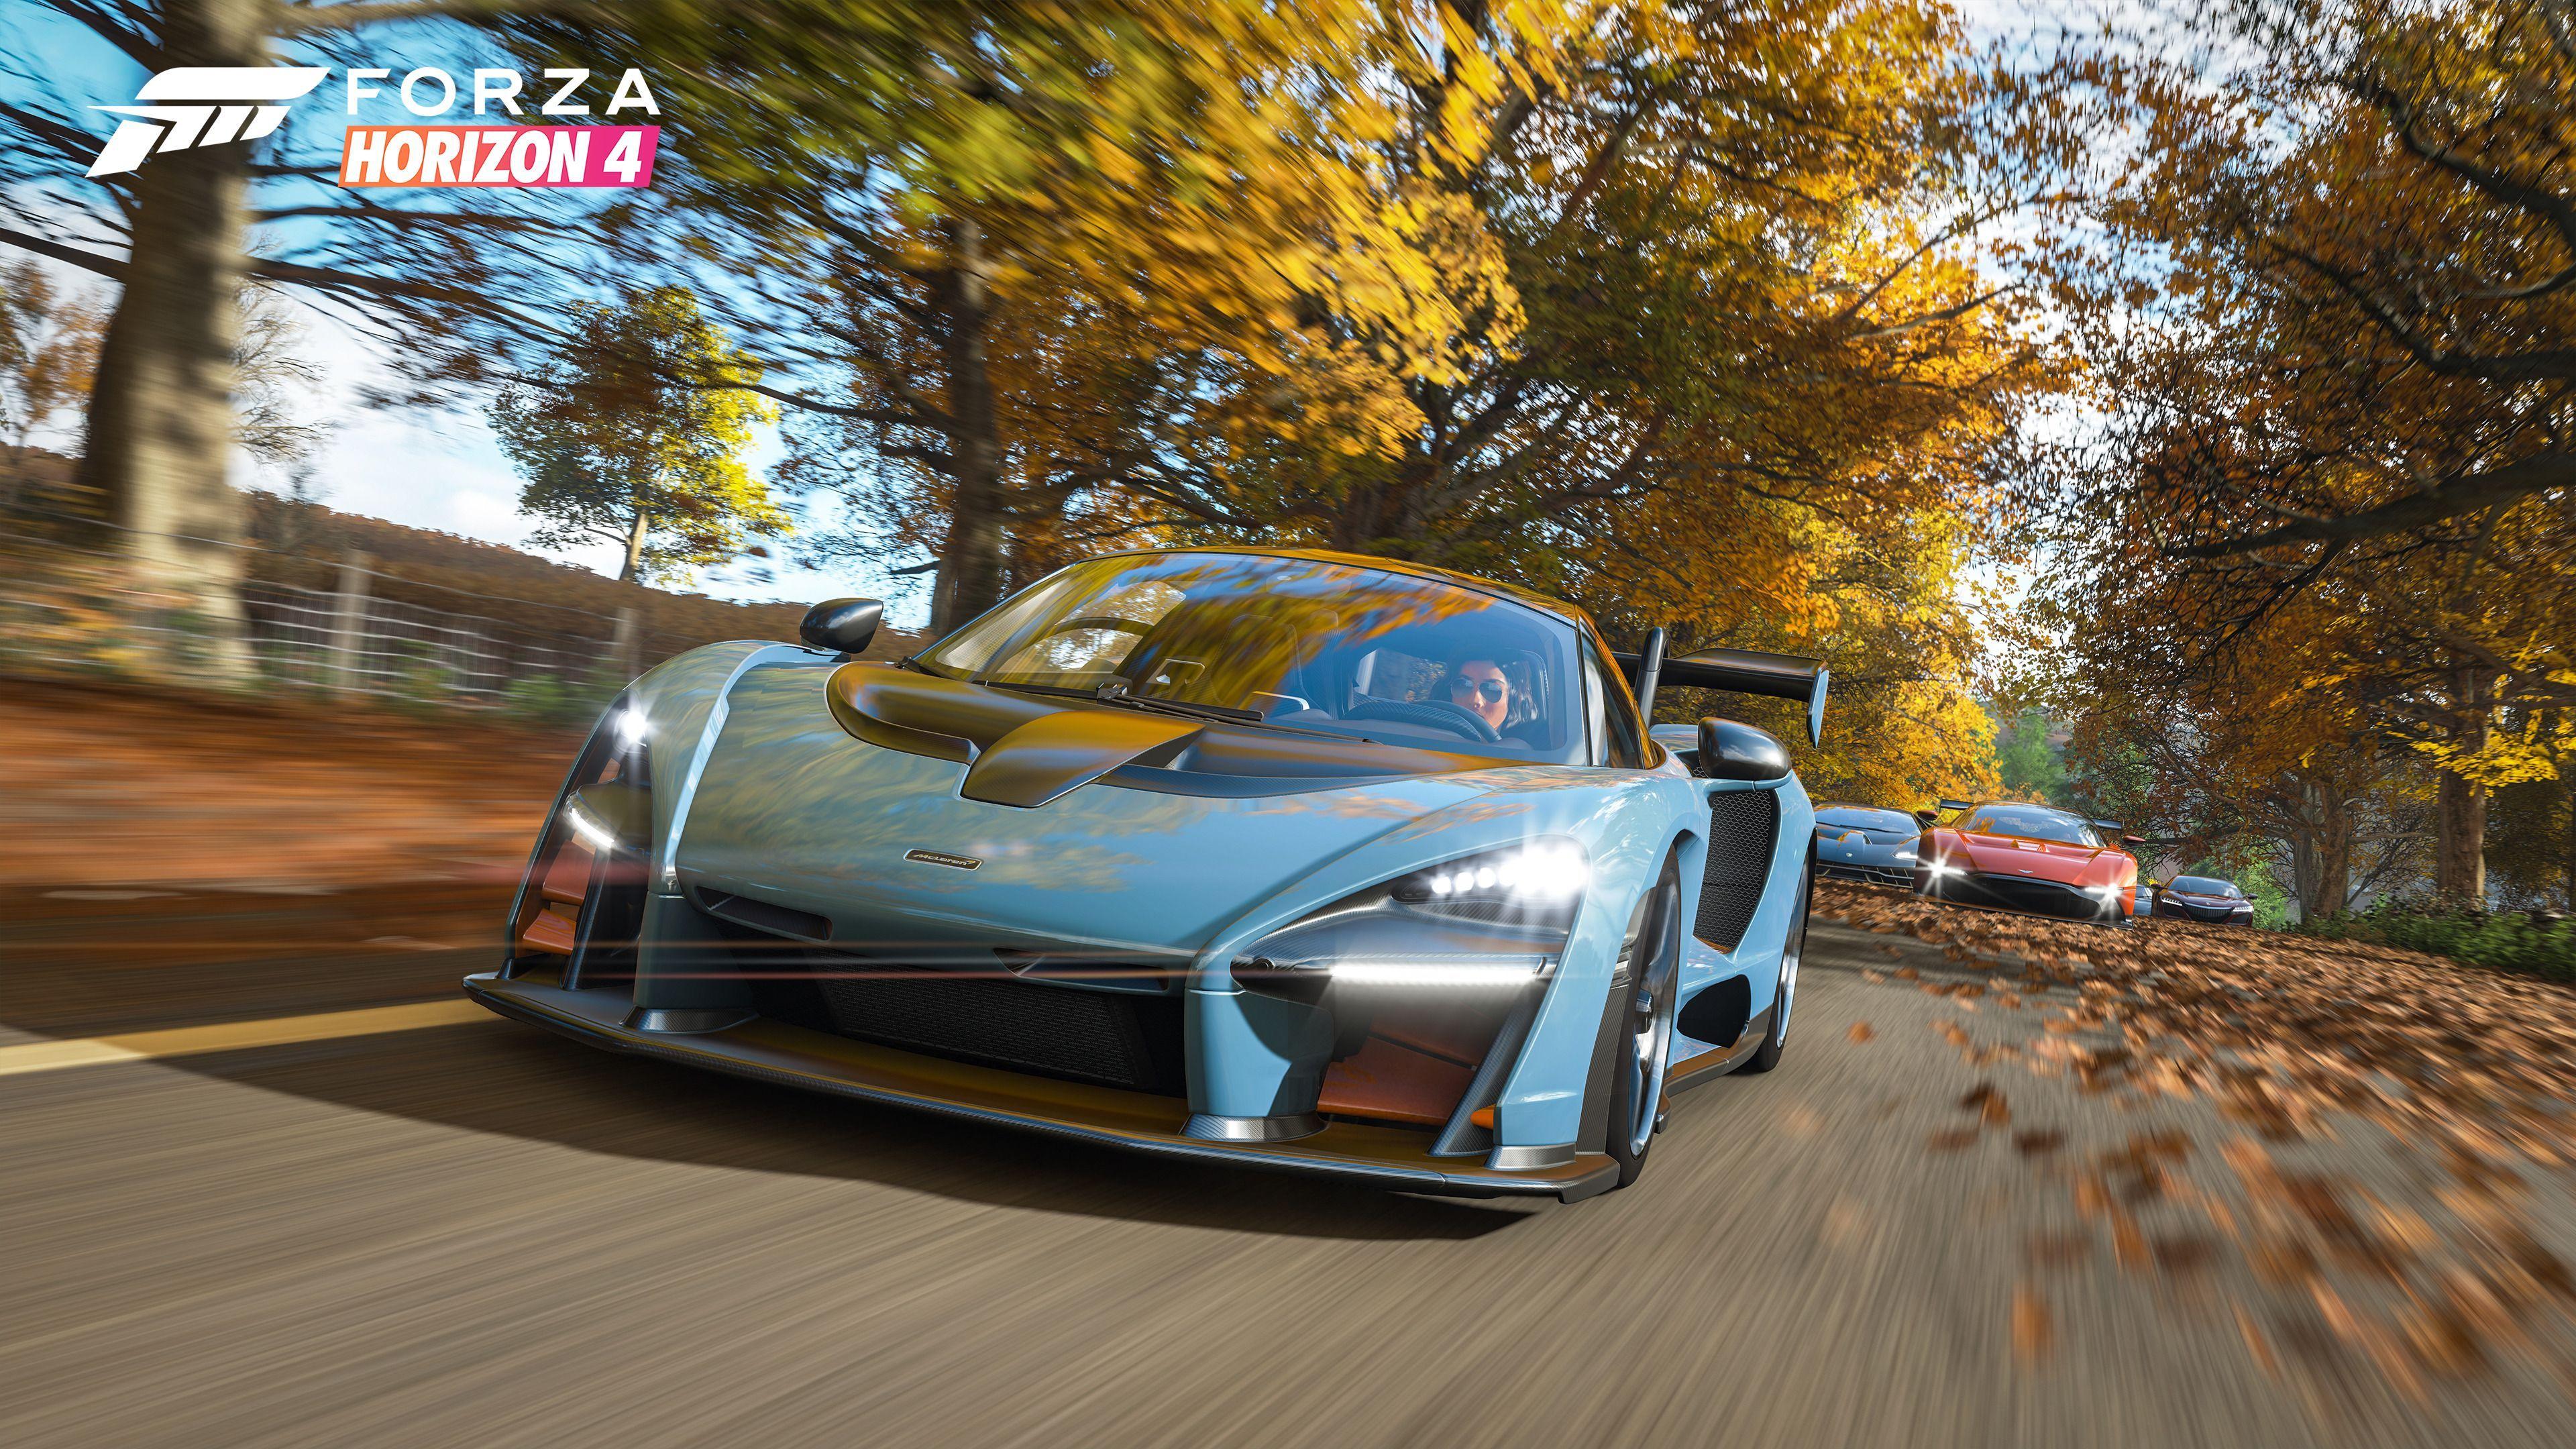 Forza Horizon 4 Wallpapers Top Free Forza Horizon 4 Backgrounds Wallpaperaccess Forza Horizon Forza Horizon 4 Forza